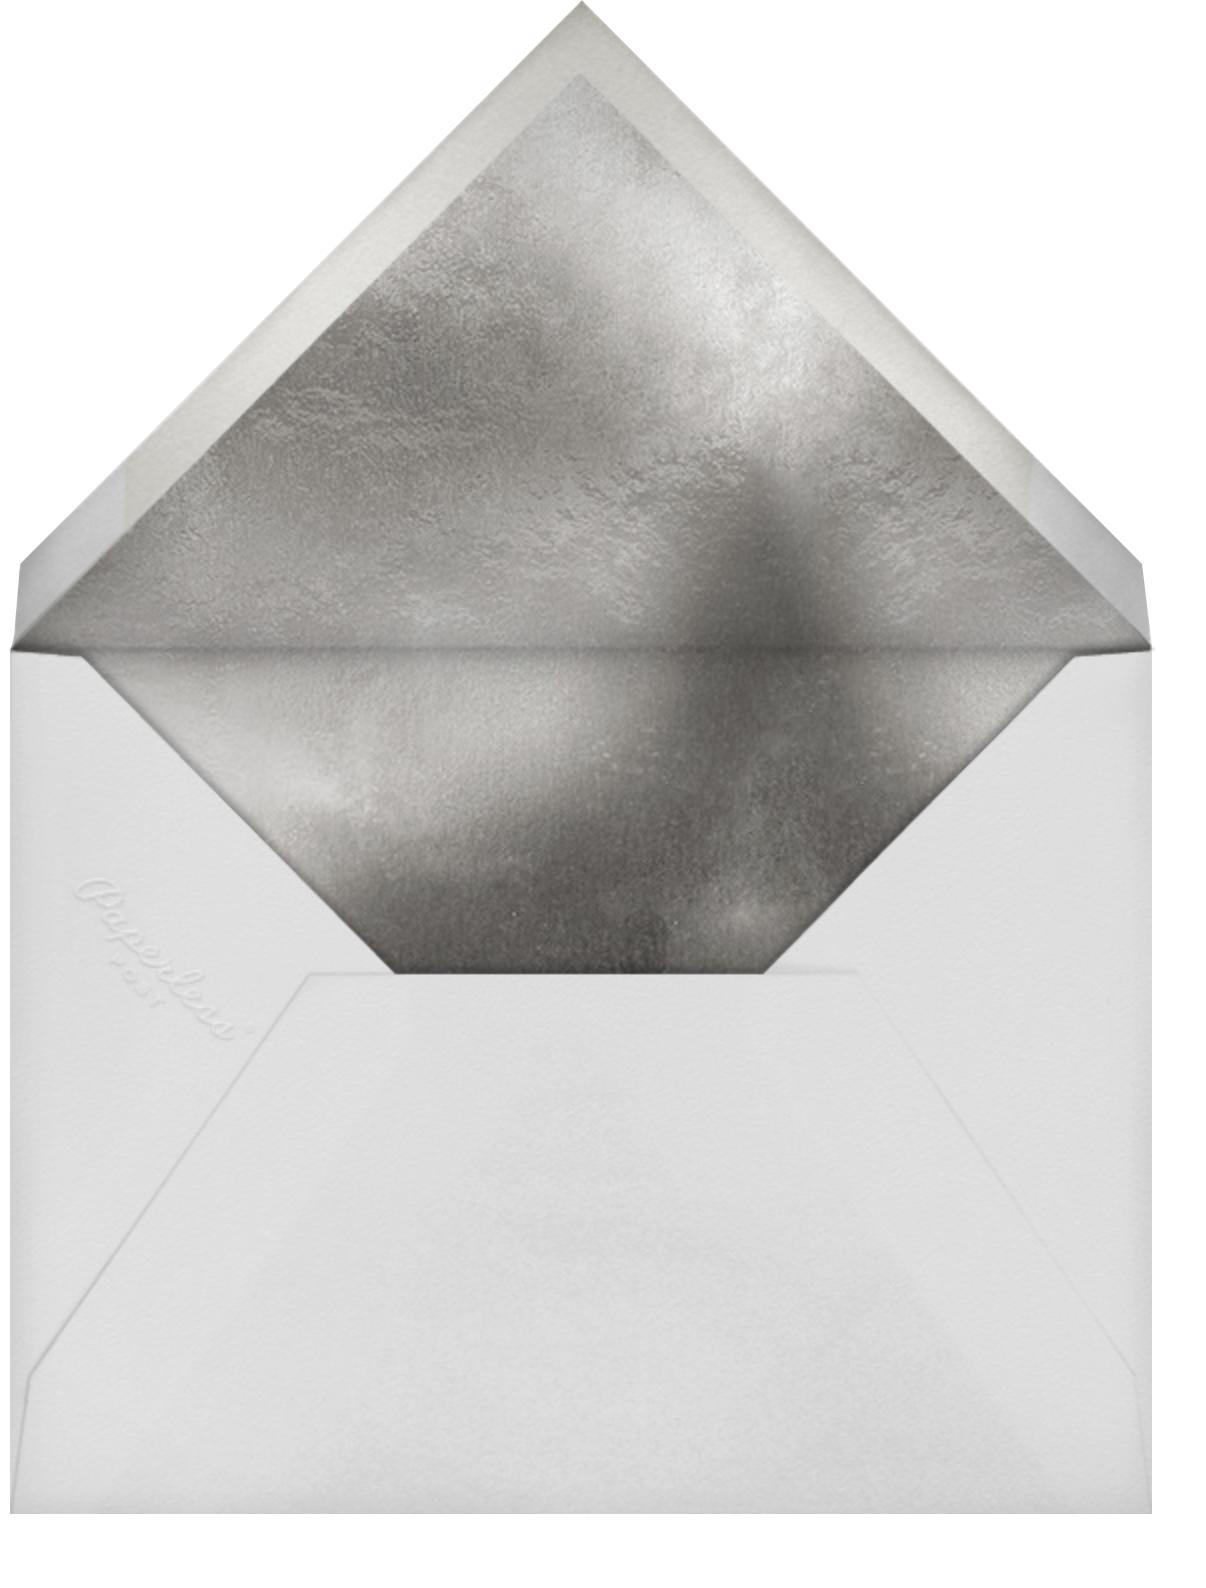 Geo - Silver and Blue - Jonathan Adler - Envelope